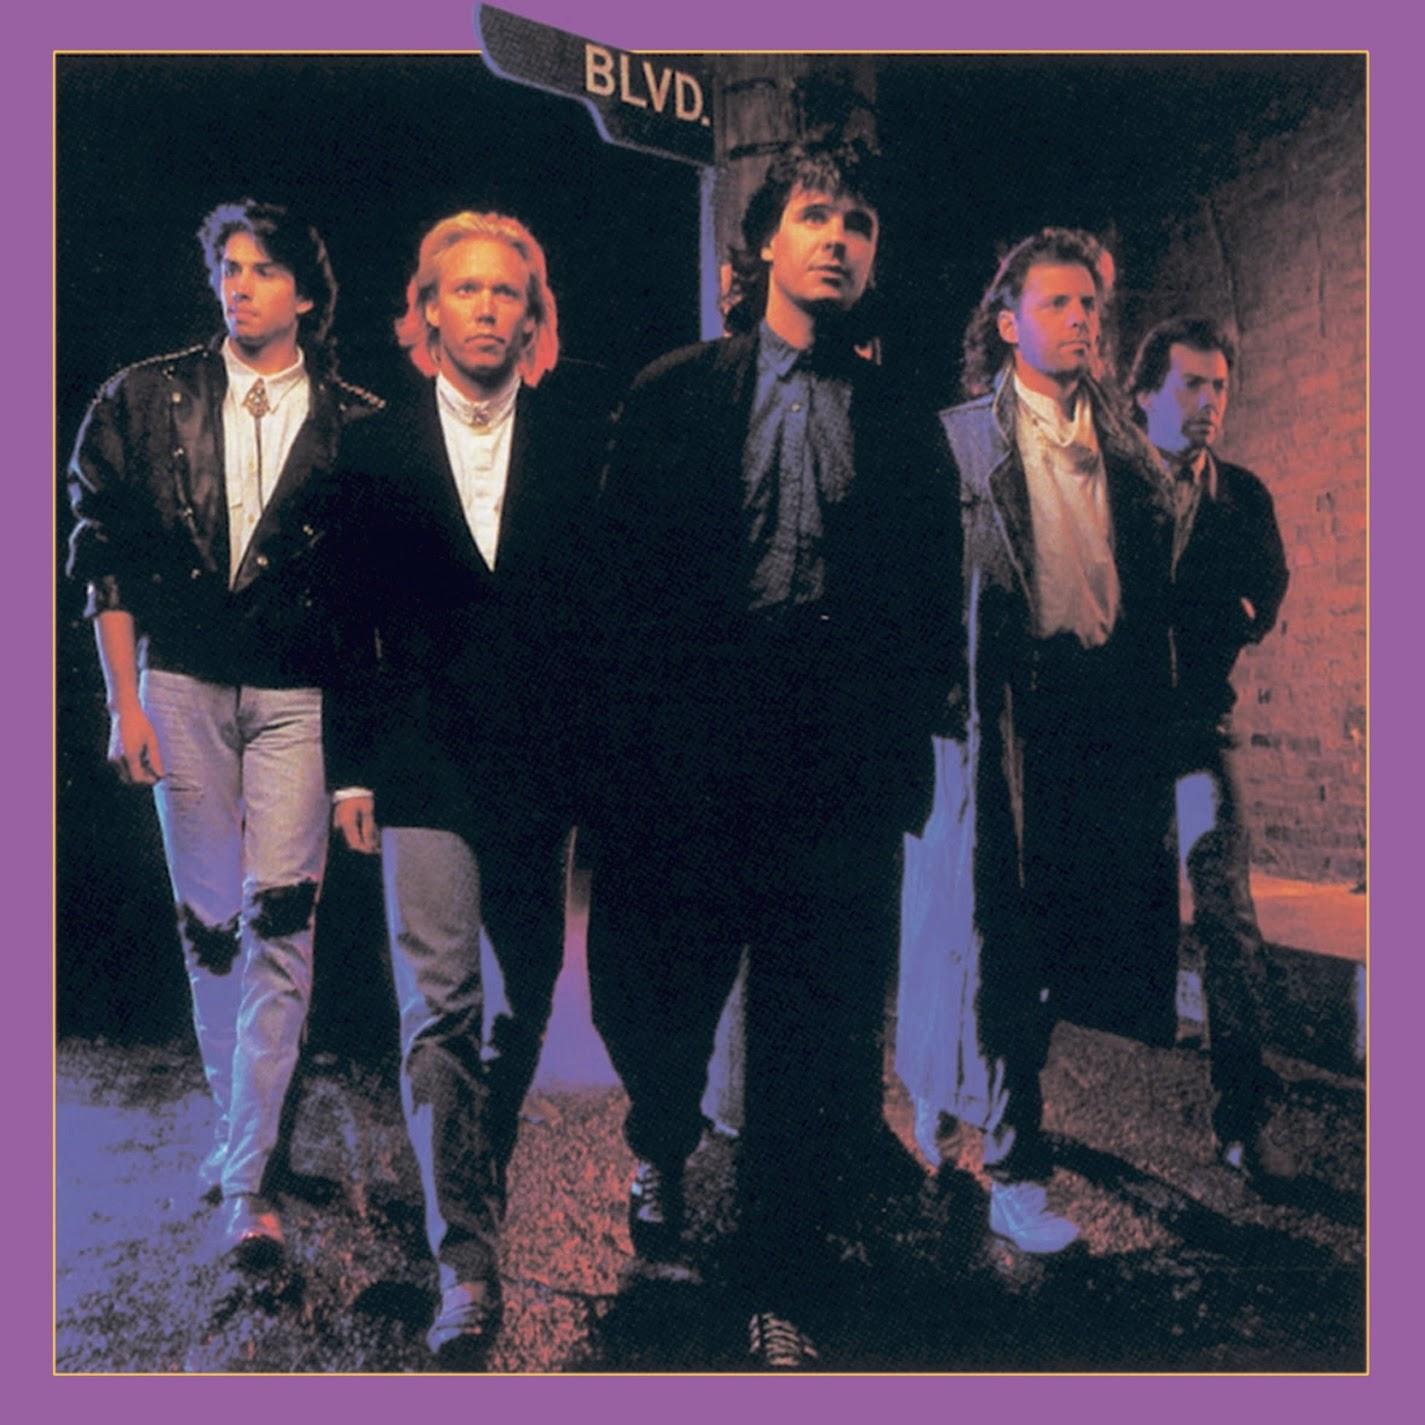 Boulevard BLVD st 1988 aor melodic rock music blogspot albums bands